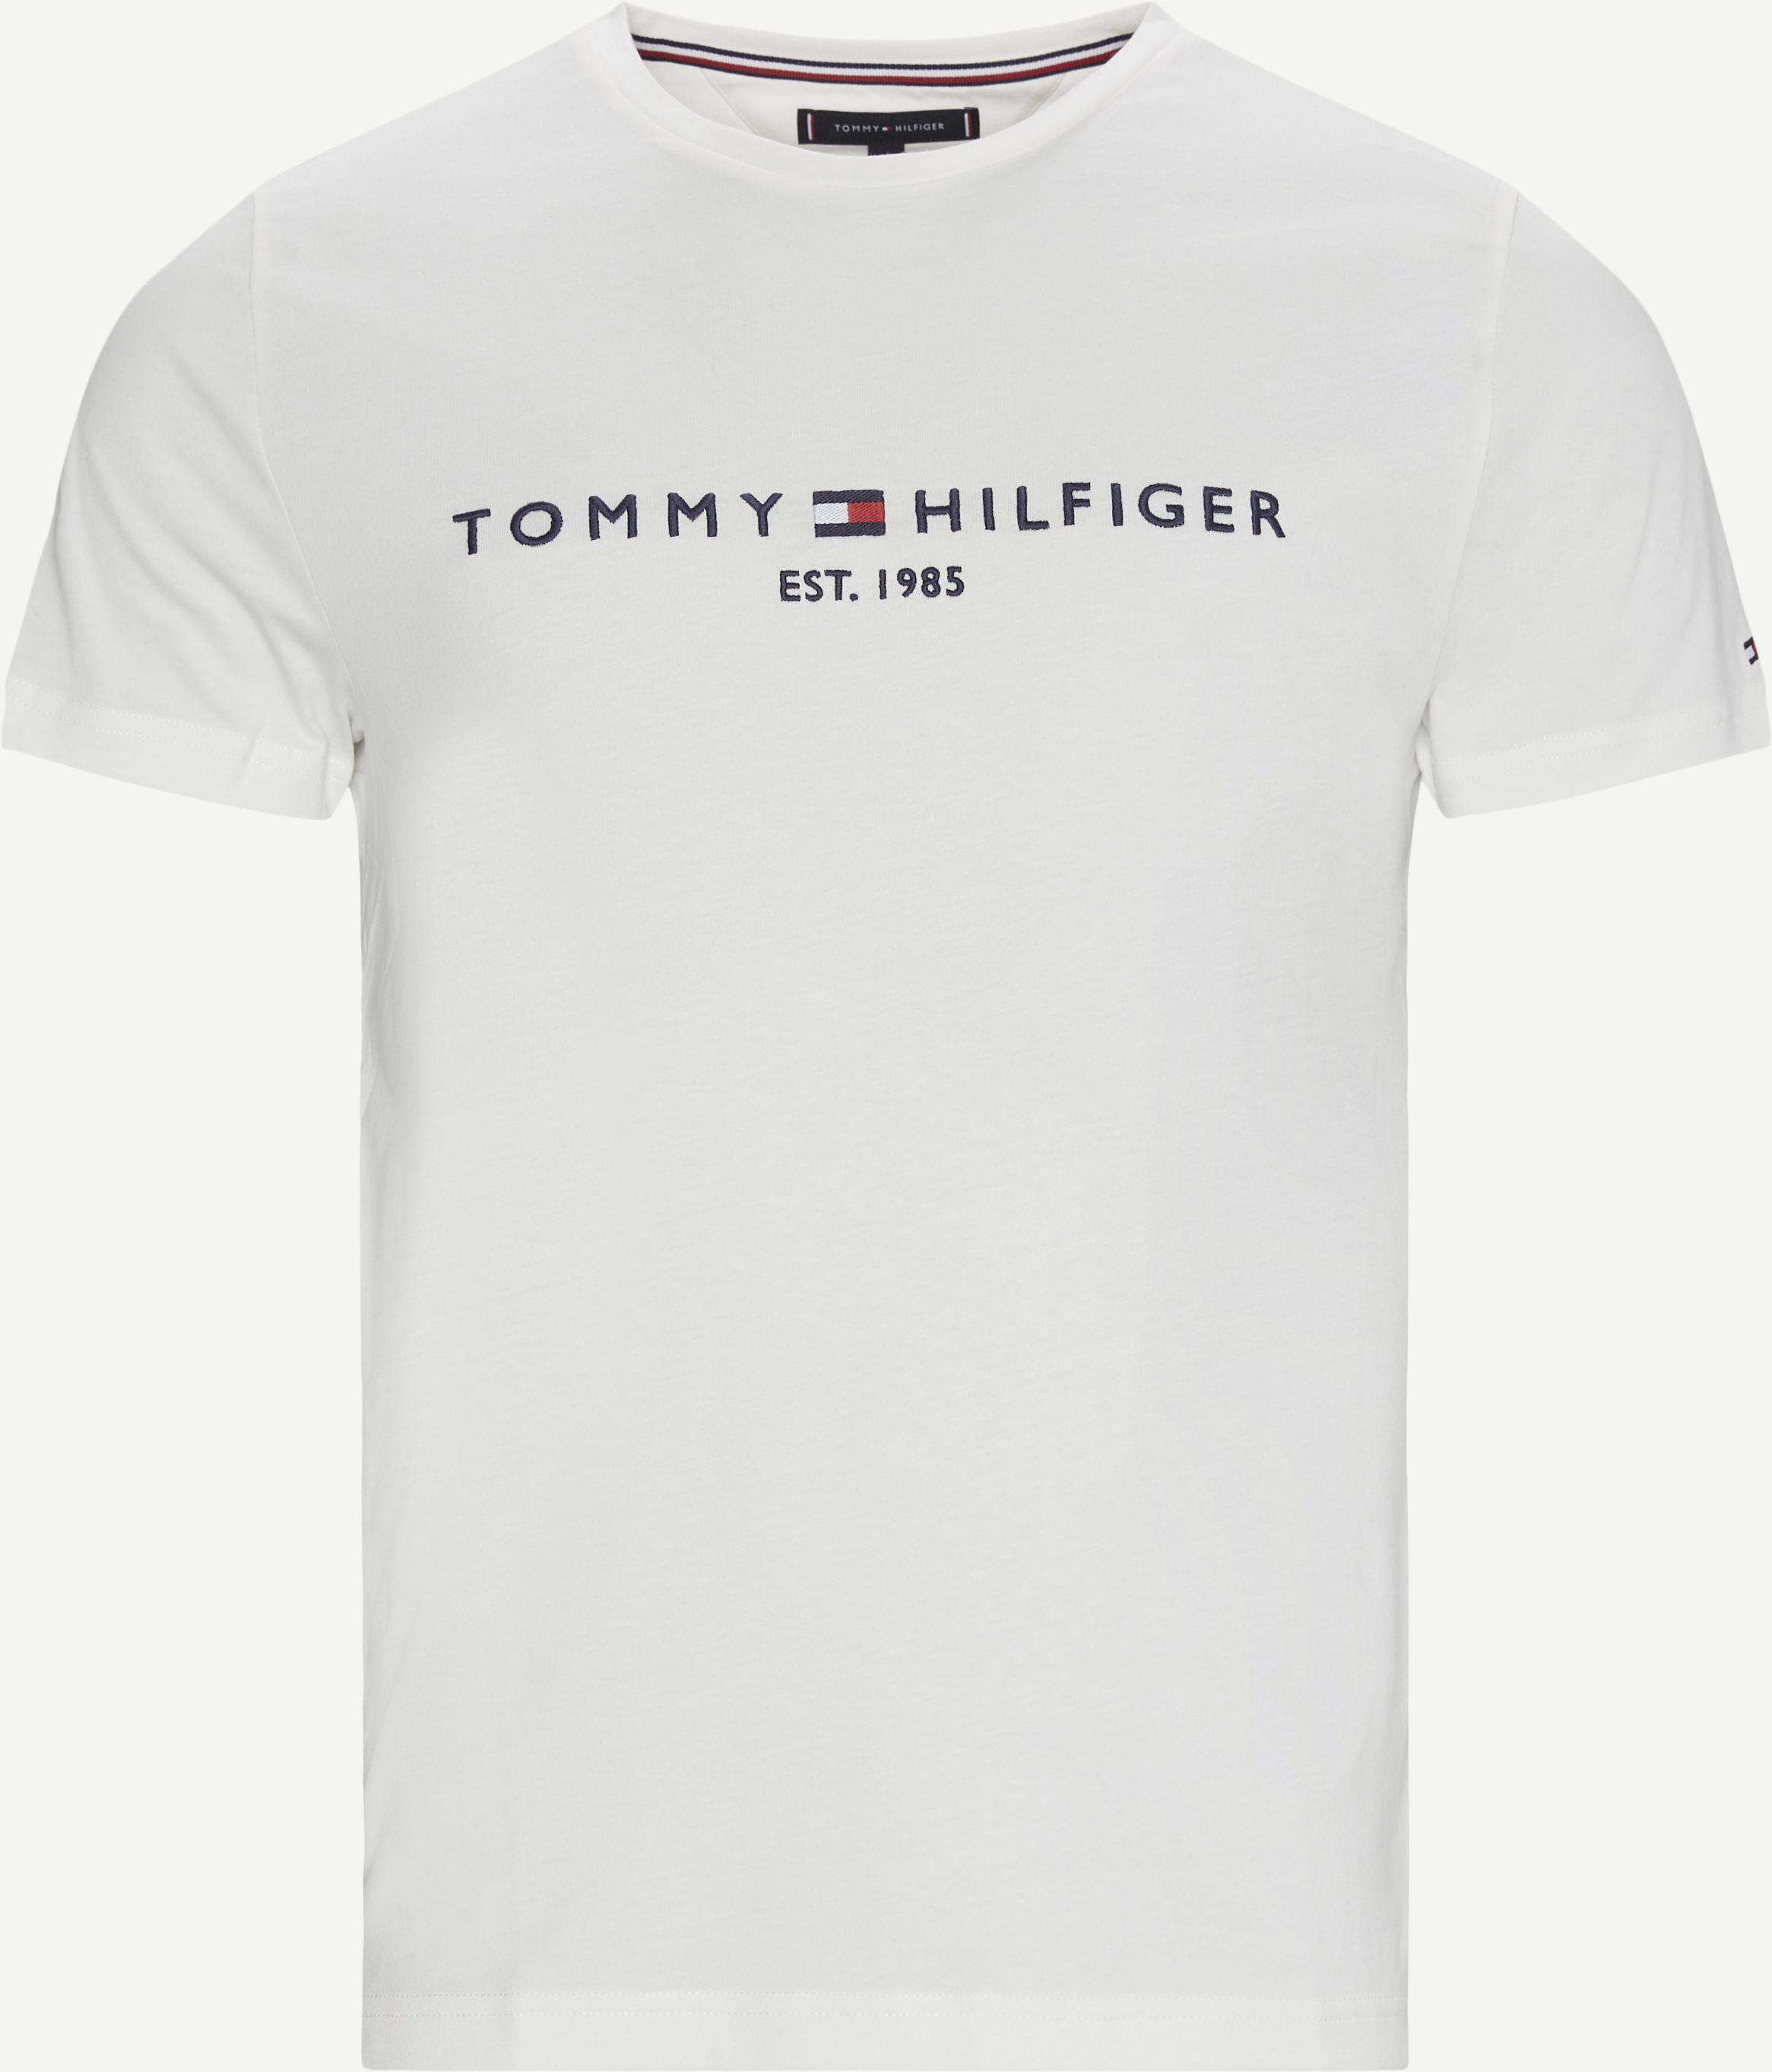 Core T-shirt - T-shirts - Regular fit - Hvid